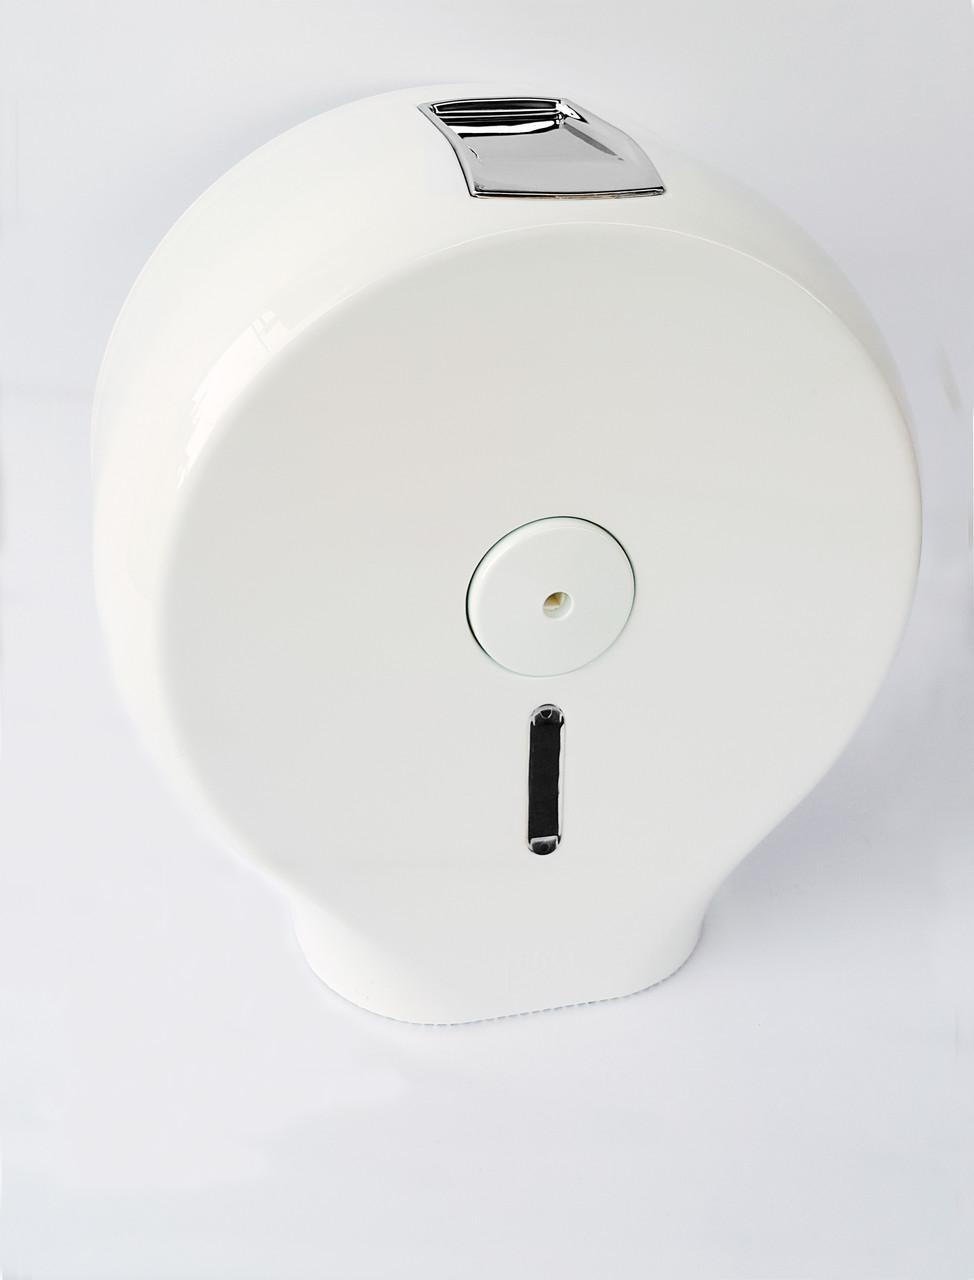 Диспенсер для туалетной бумаги АБС пластик, 9293 белый глянцевый